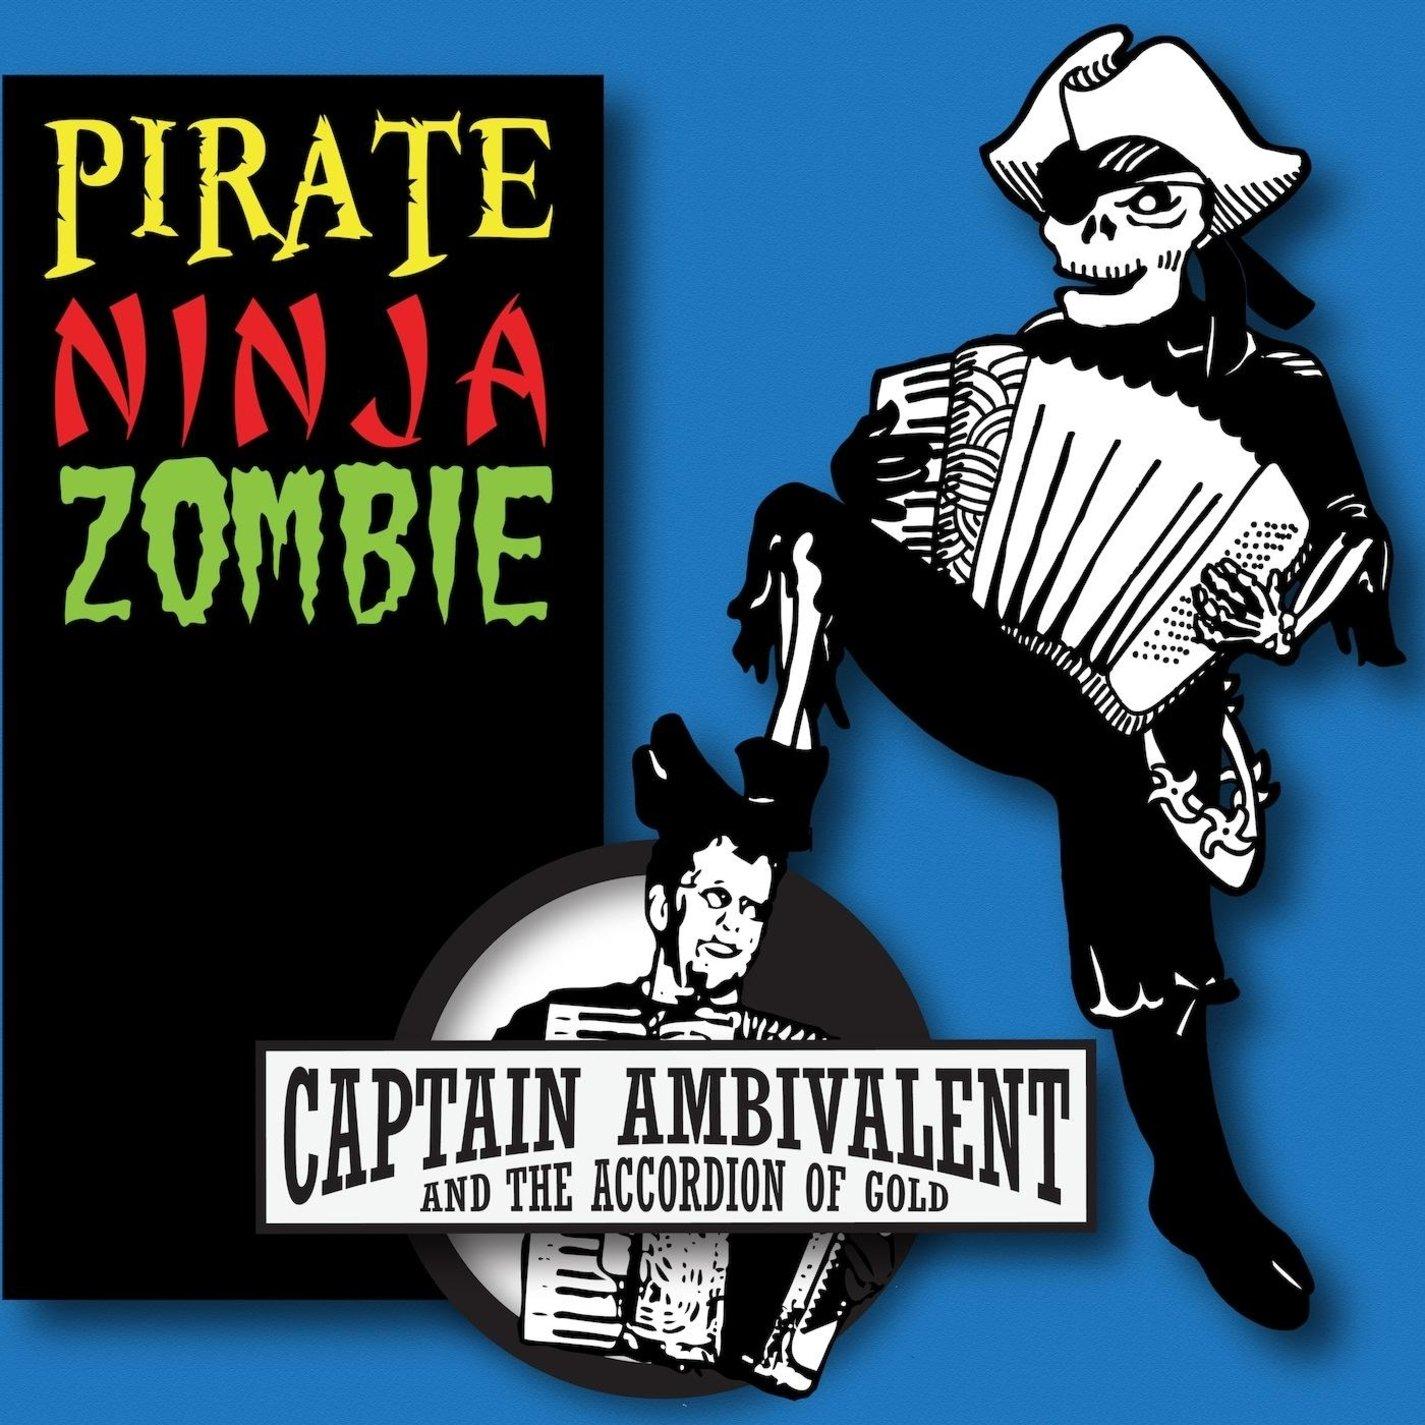 Pirate Ninja Zombie: Captain Ambivalent: Amazon.es: Música